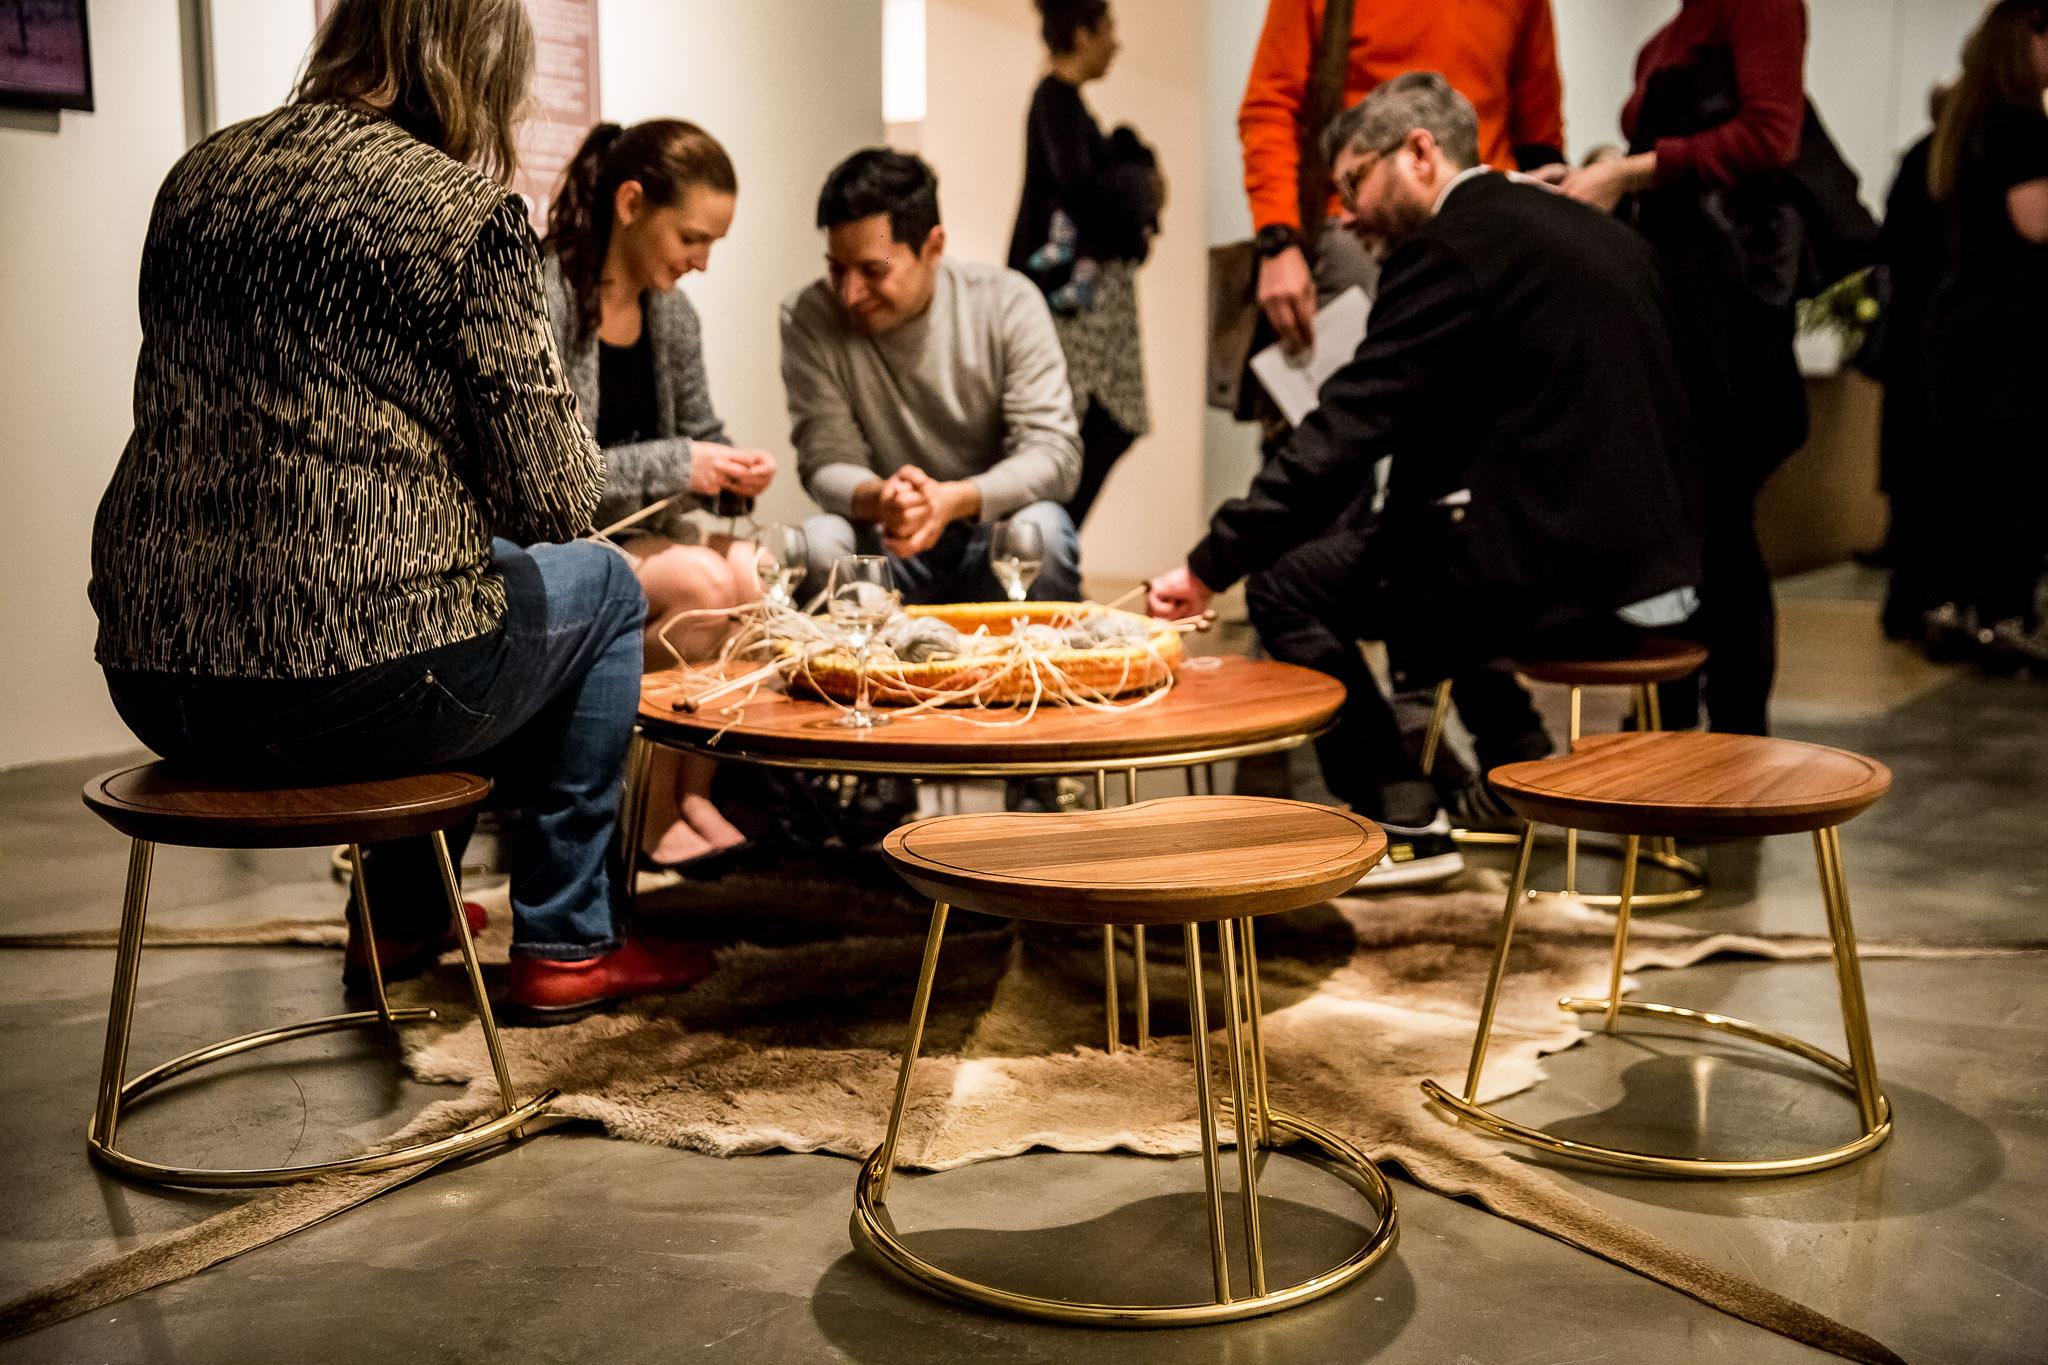 Vivid Award for Furniture Design, Nyinajimanha by Nicole Monks